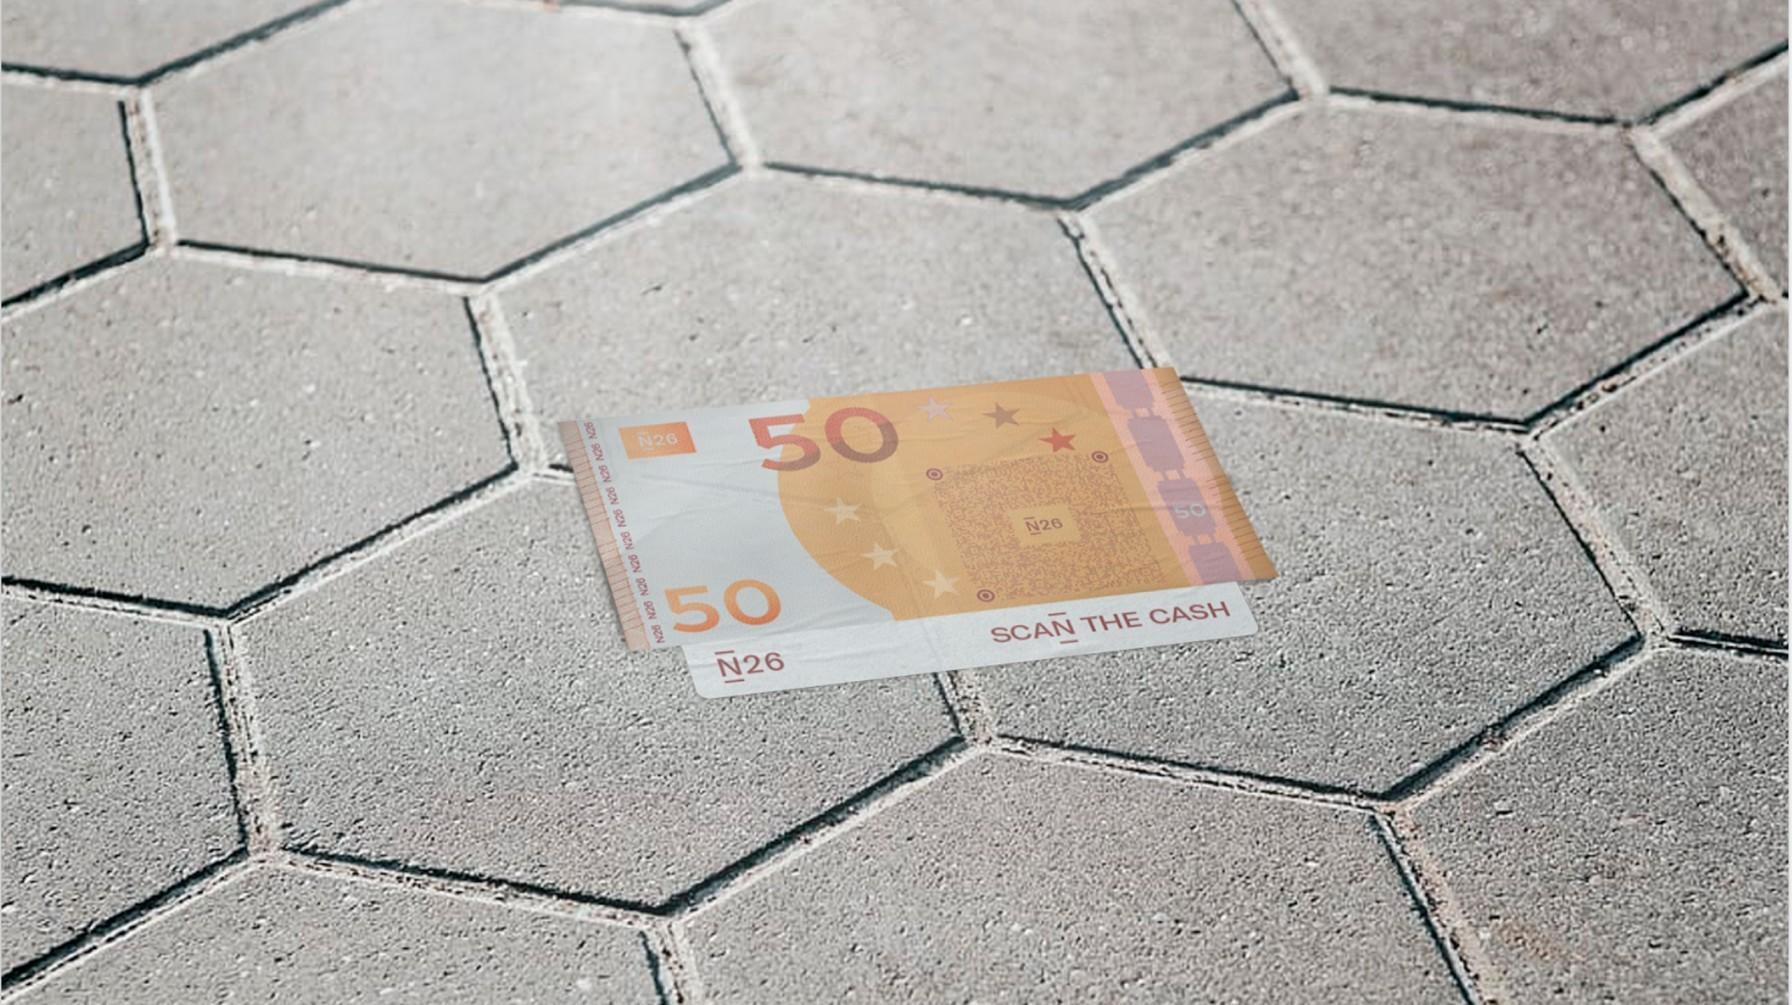 Billete de 50 euros de N26